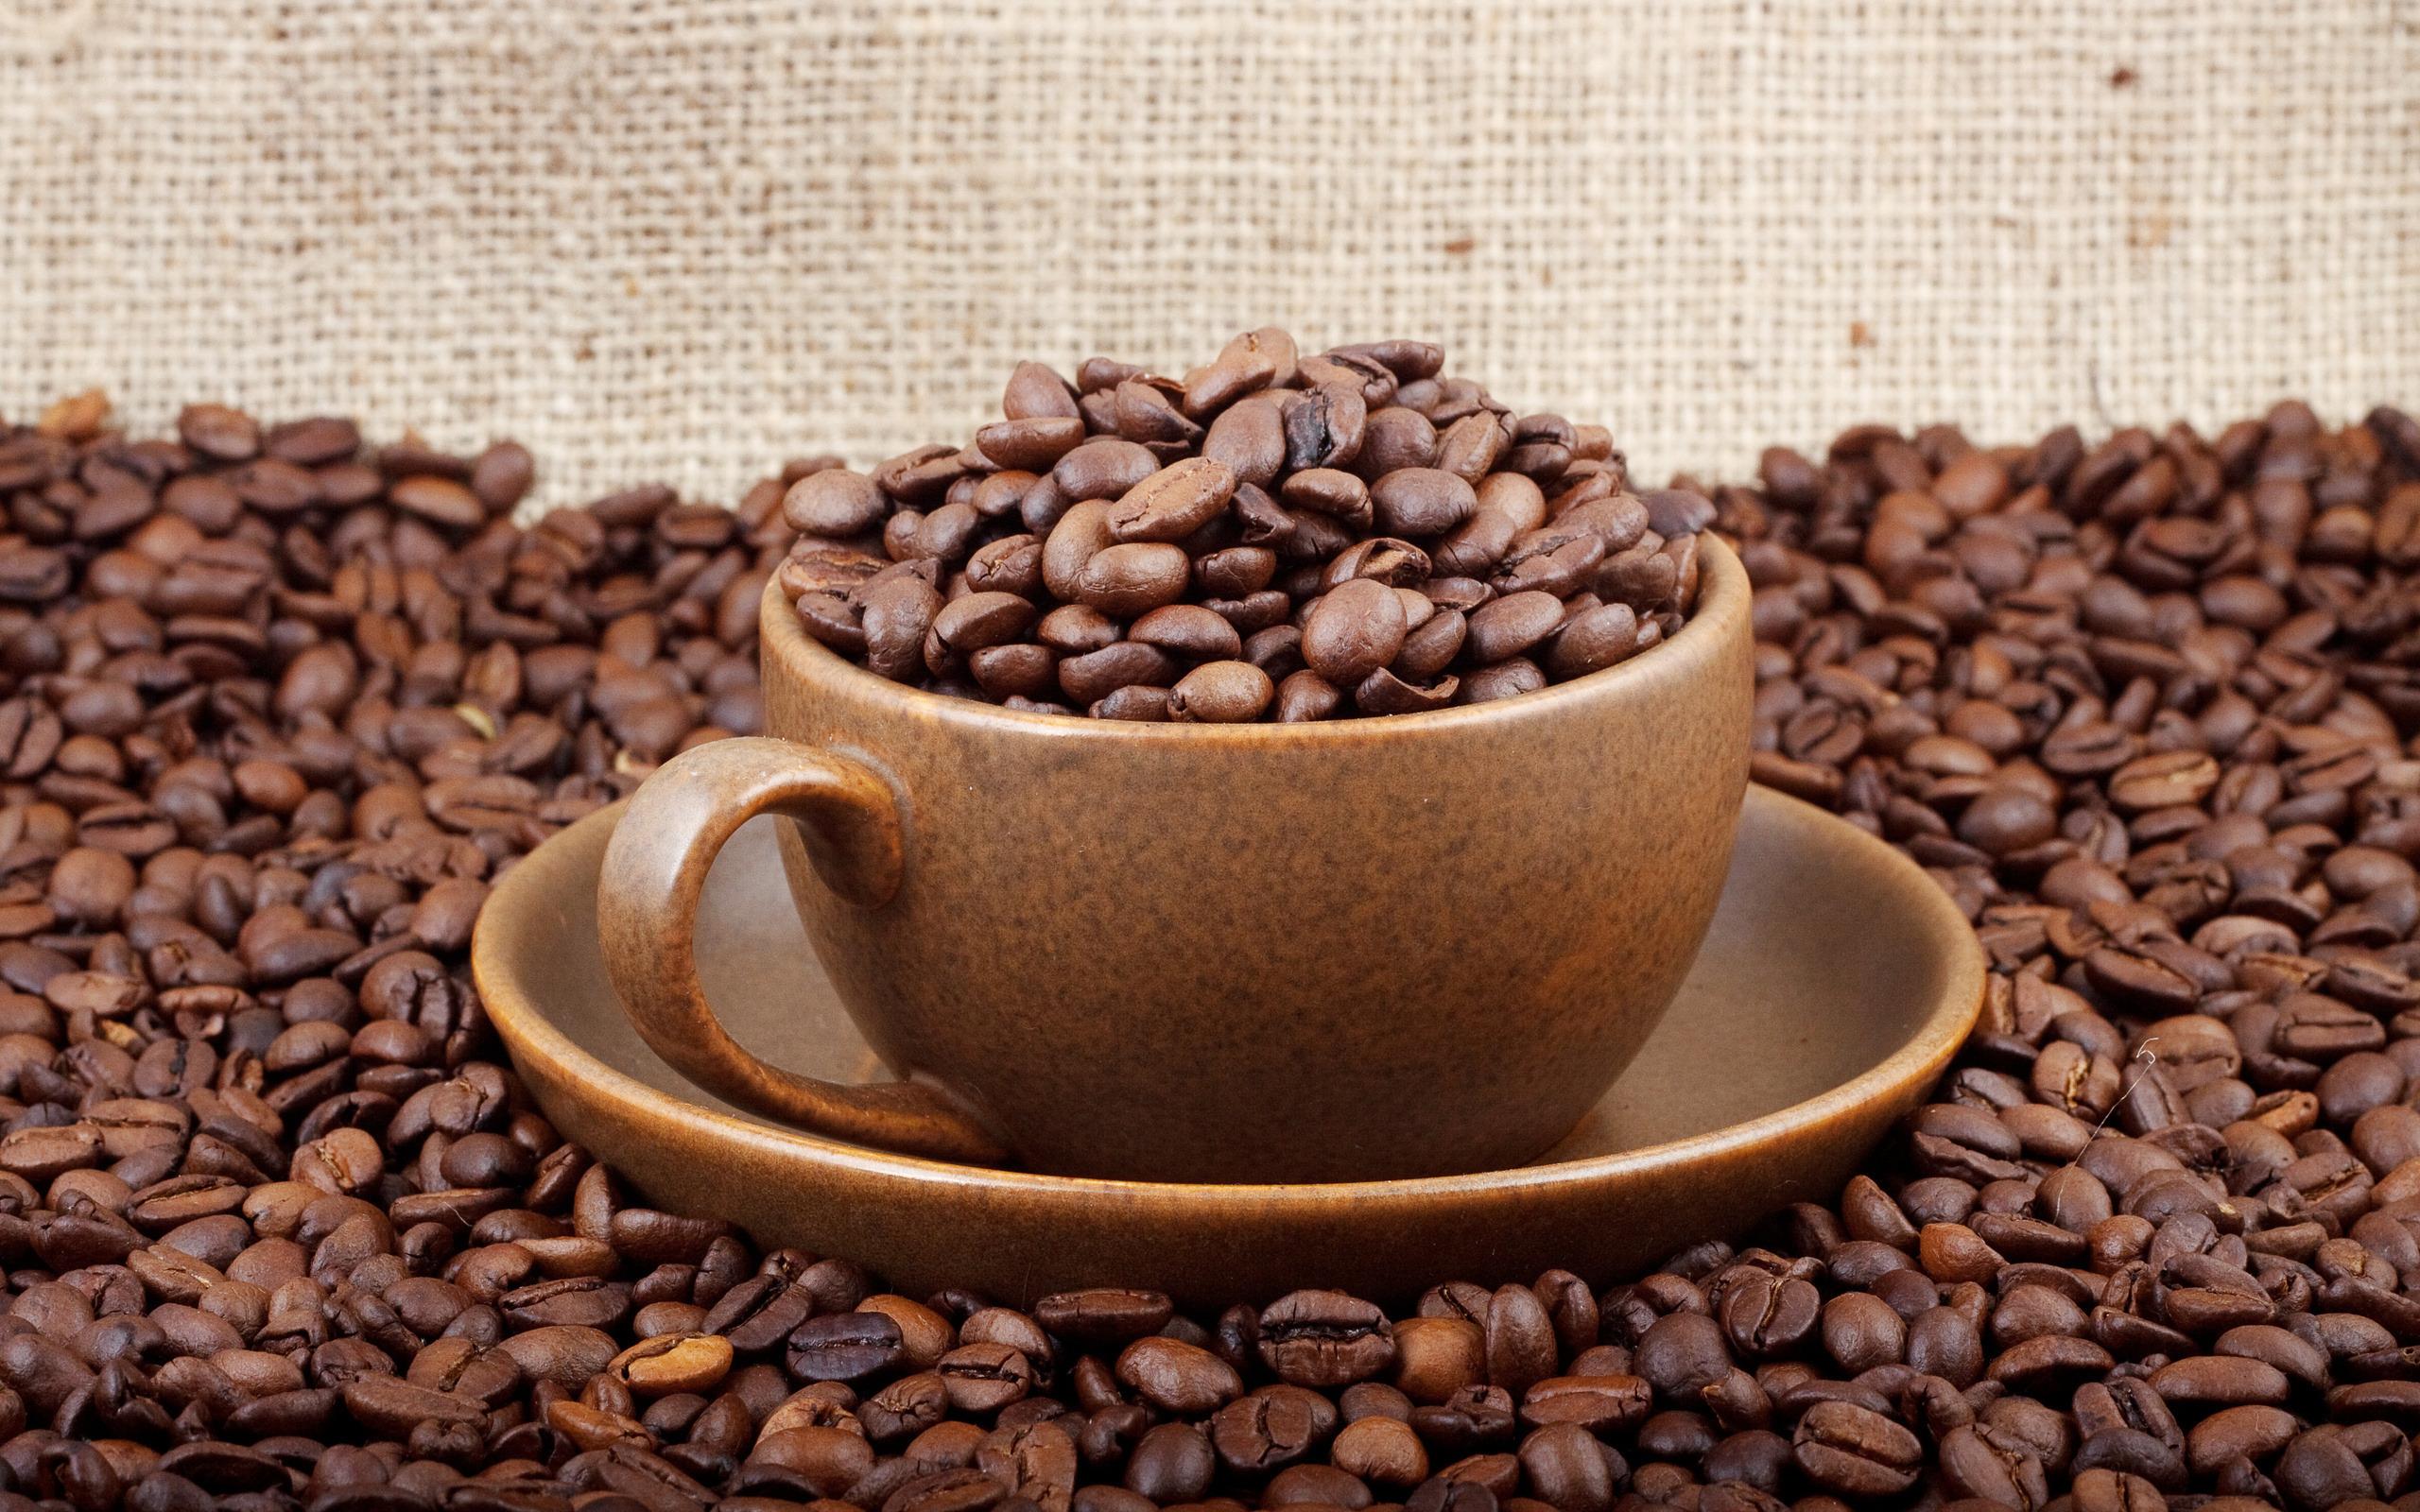 Кофе зерна чашка  № 2172499 бесплатно